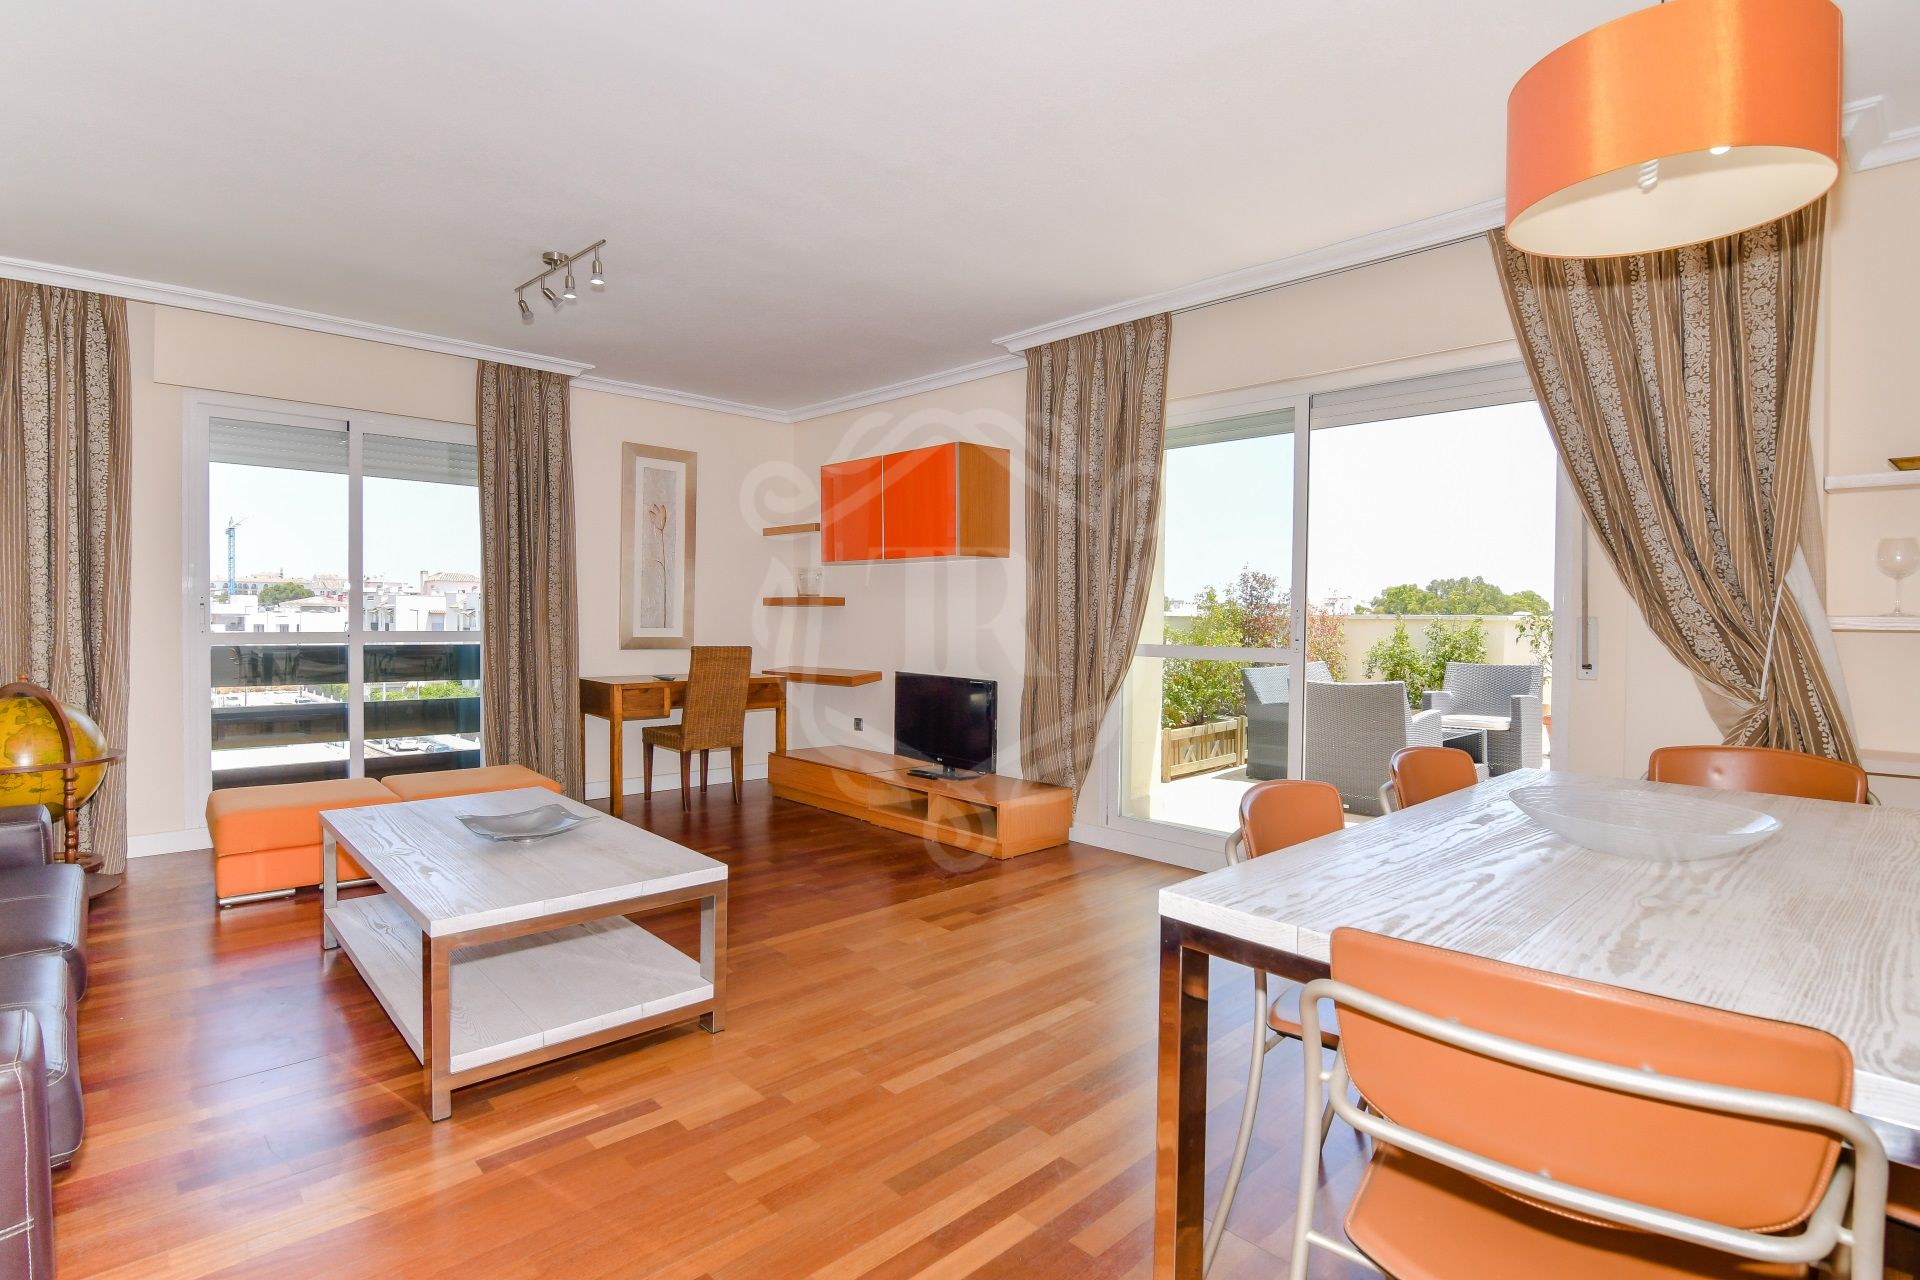 Penthouse for sale in Lorcrimar, Nueva Andalucia